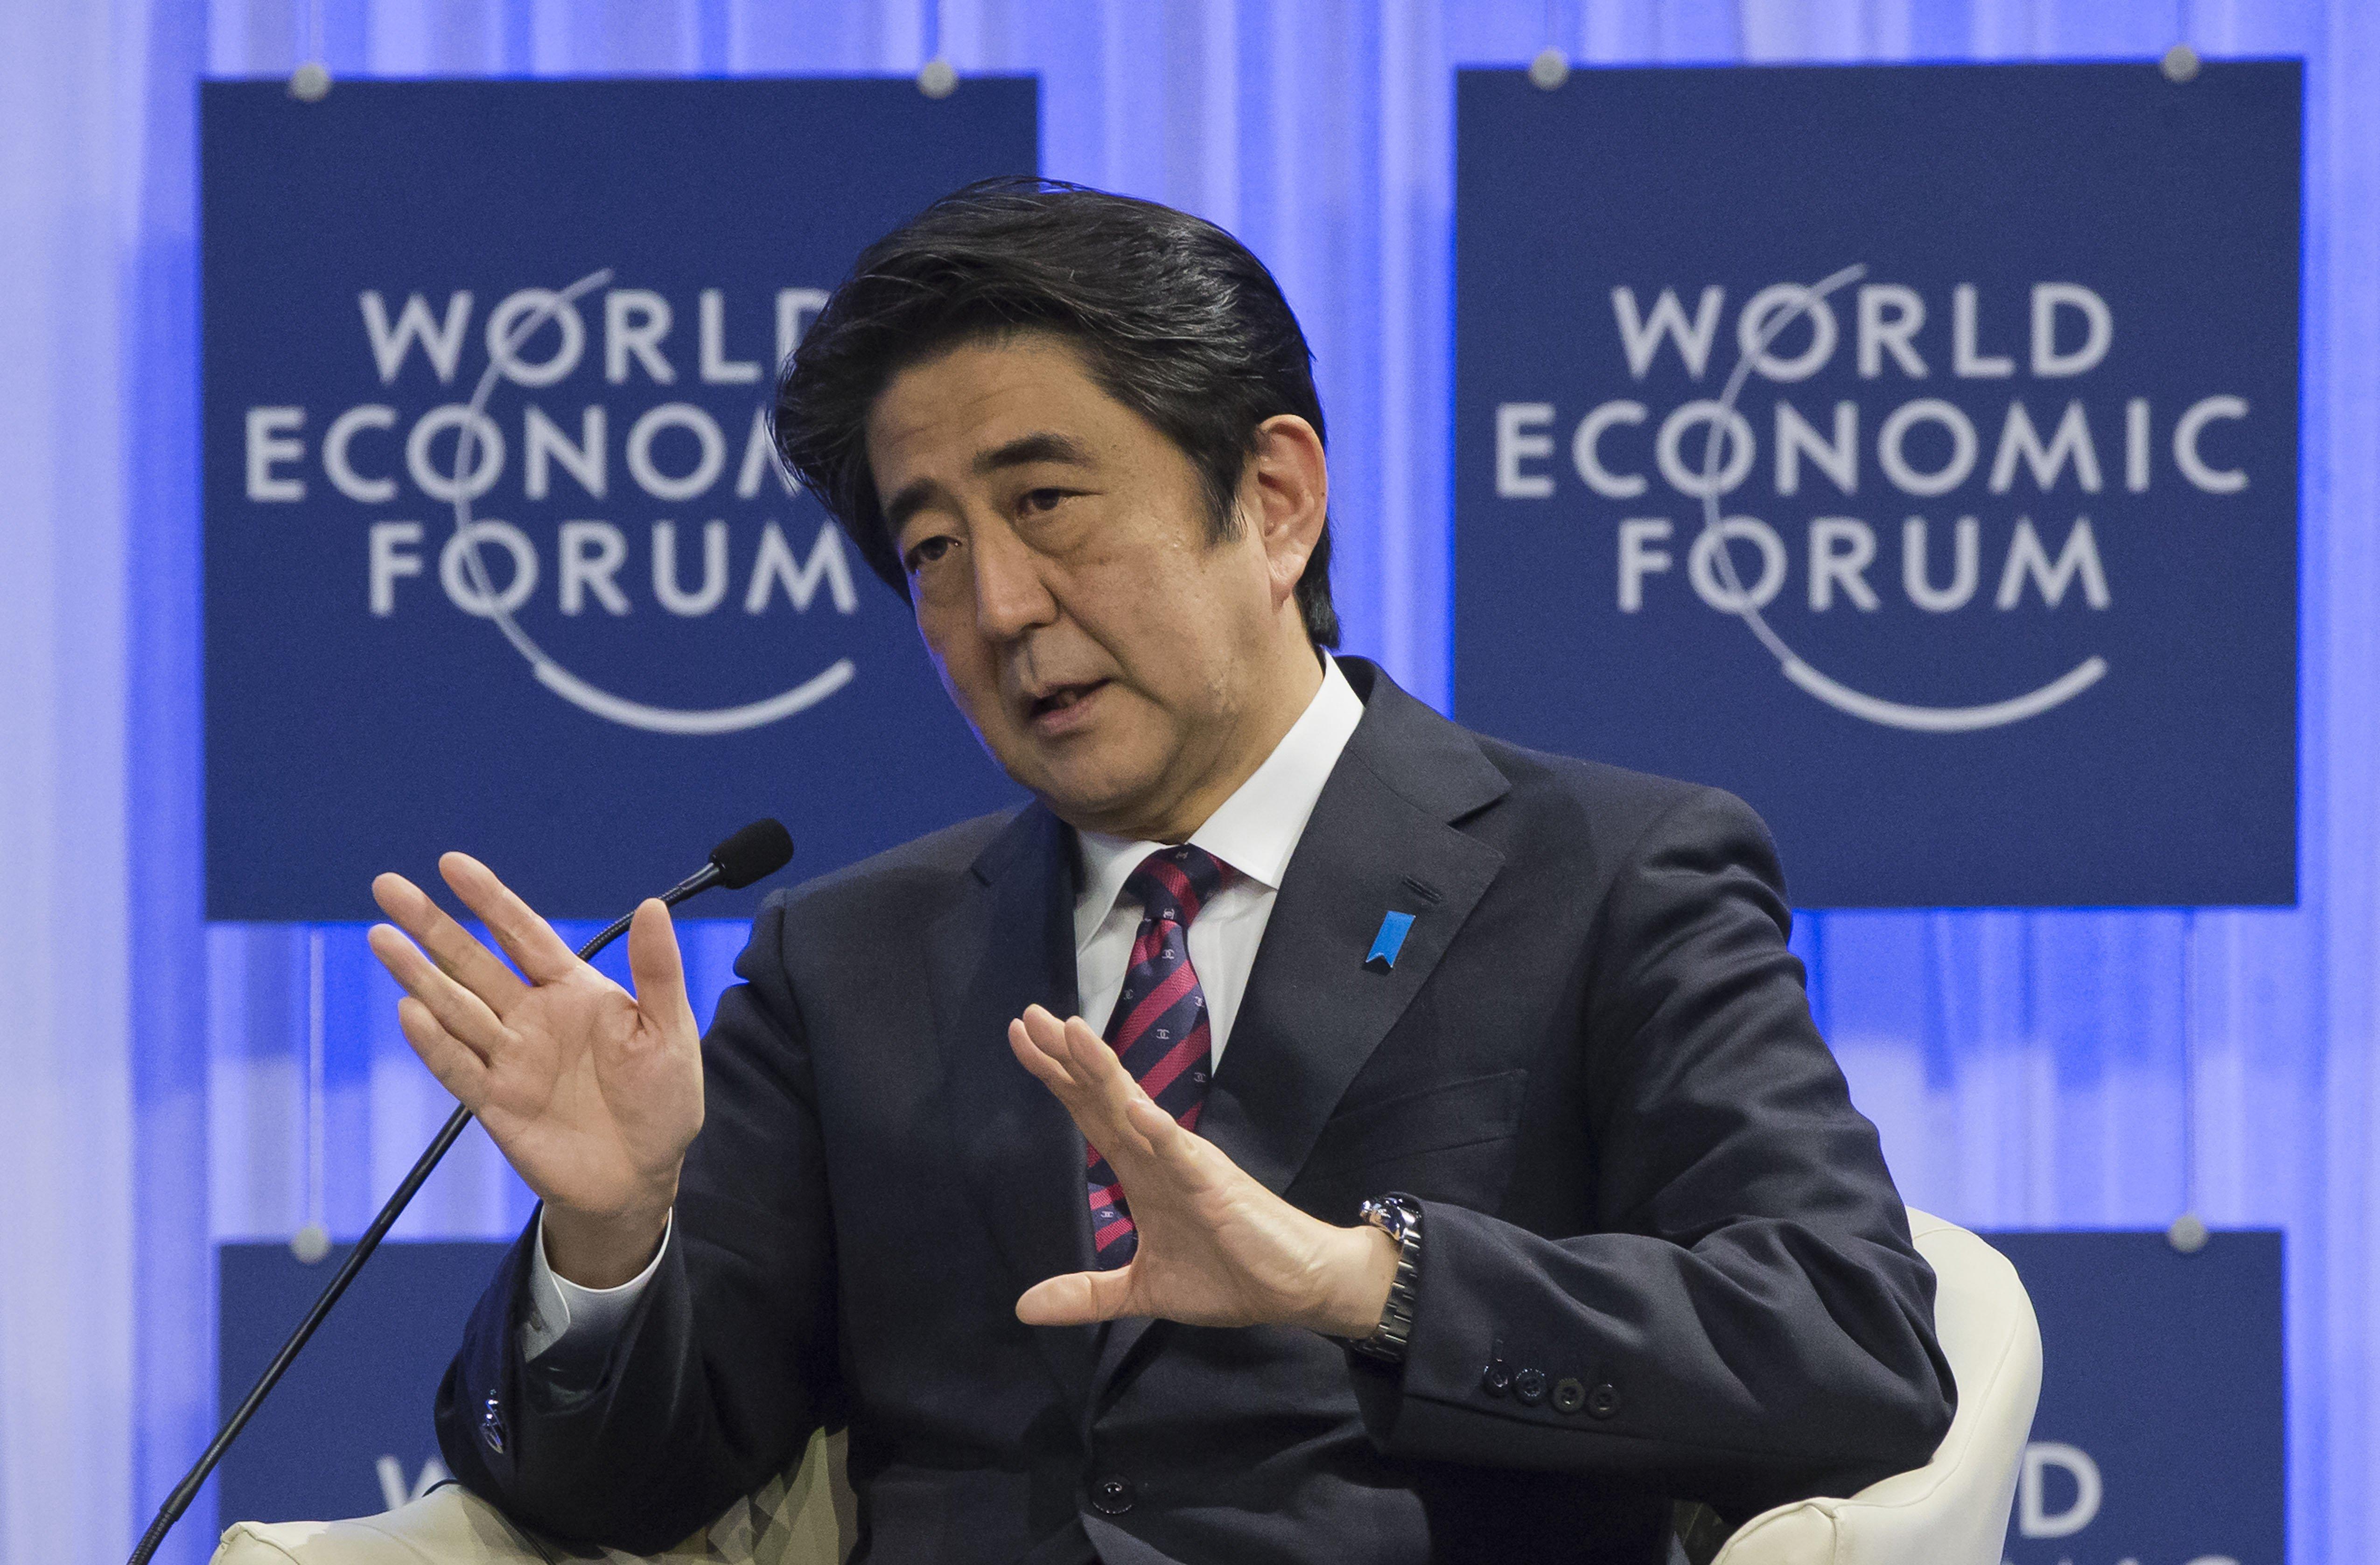 Japanese Prime Minister Shinzo Abe speaks at the World Economic Forum in Davos, Switzerland, on Jan. 22, 2014